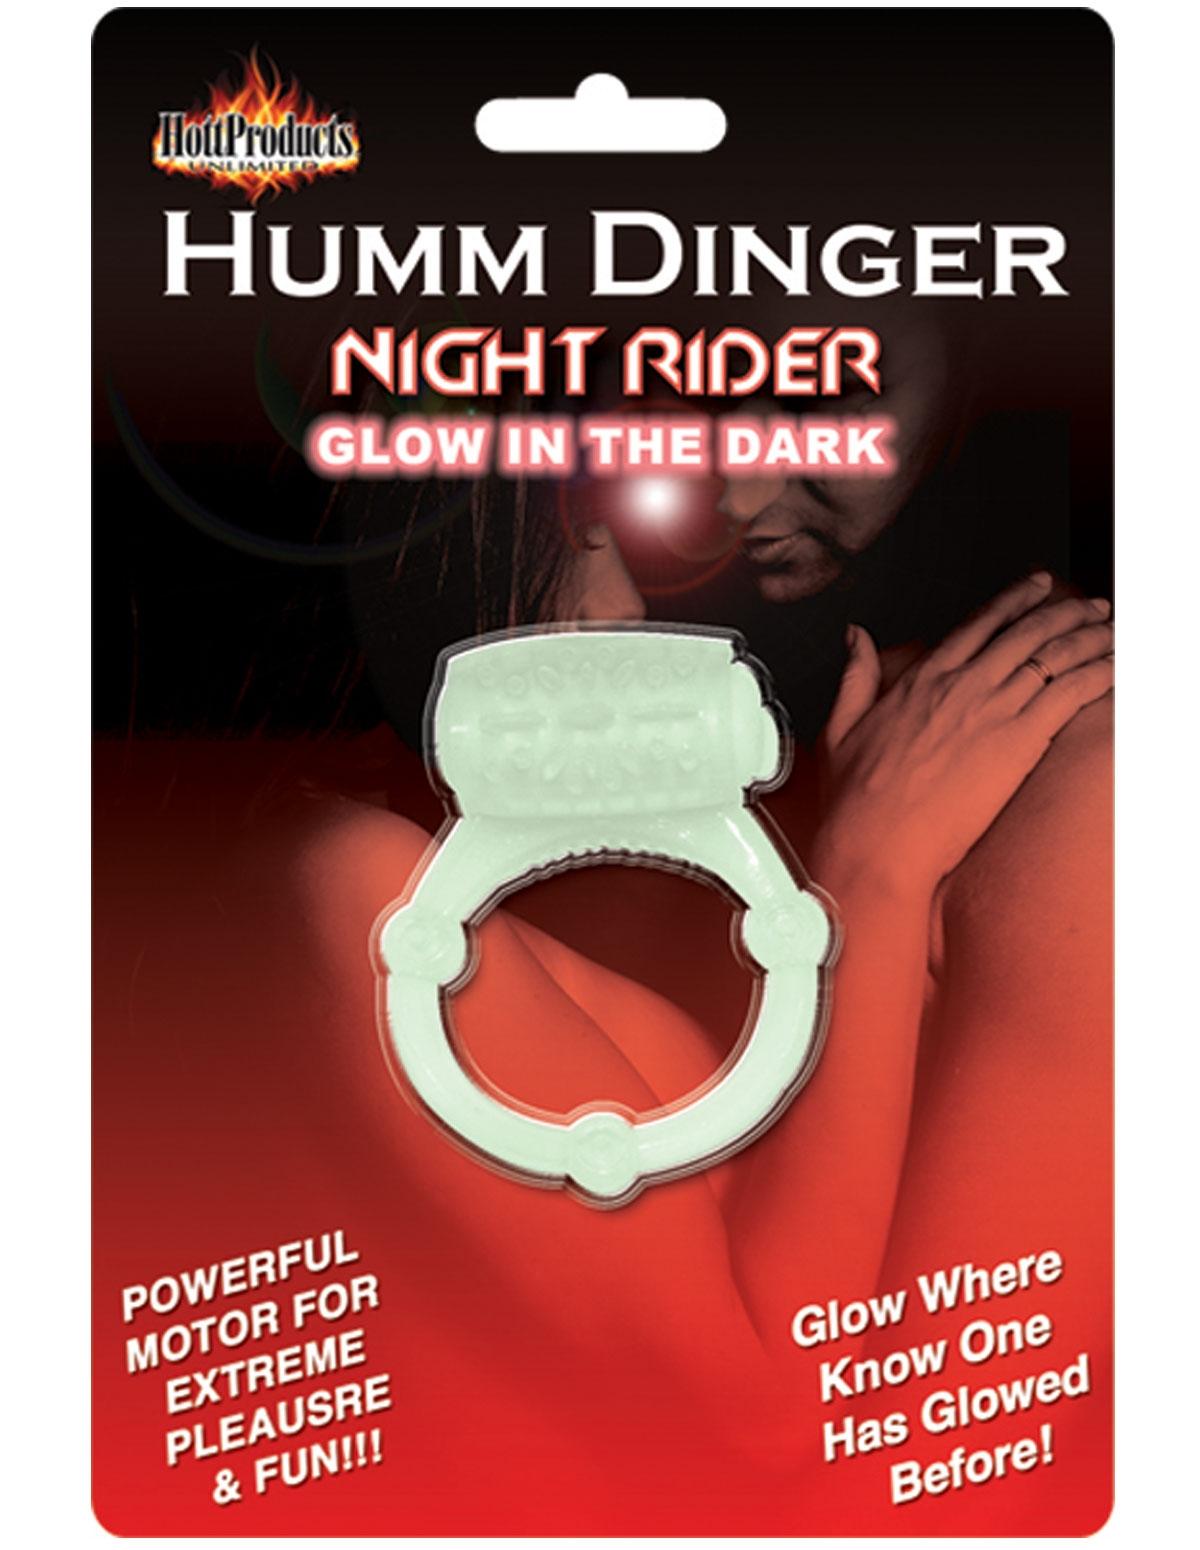 Glow In The Dark Hummdinger Couples Toy